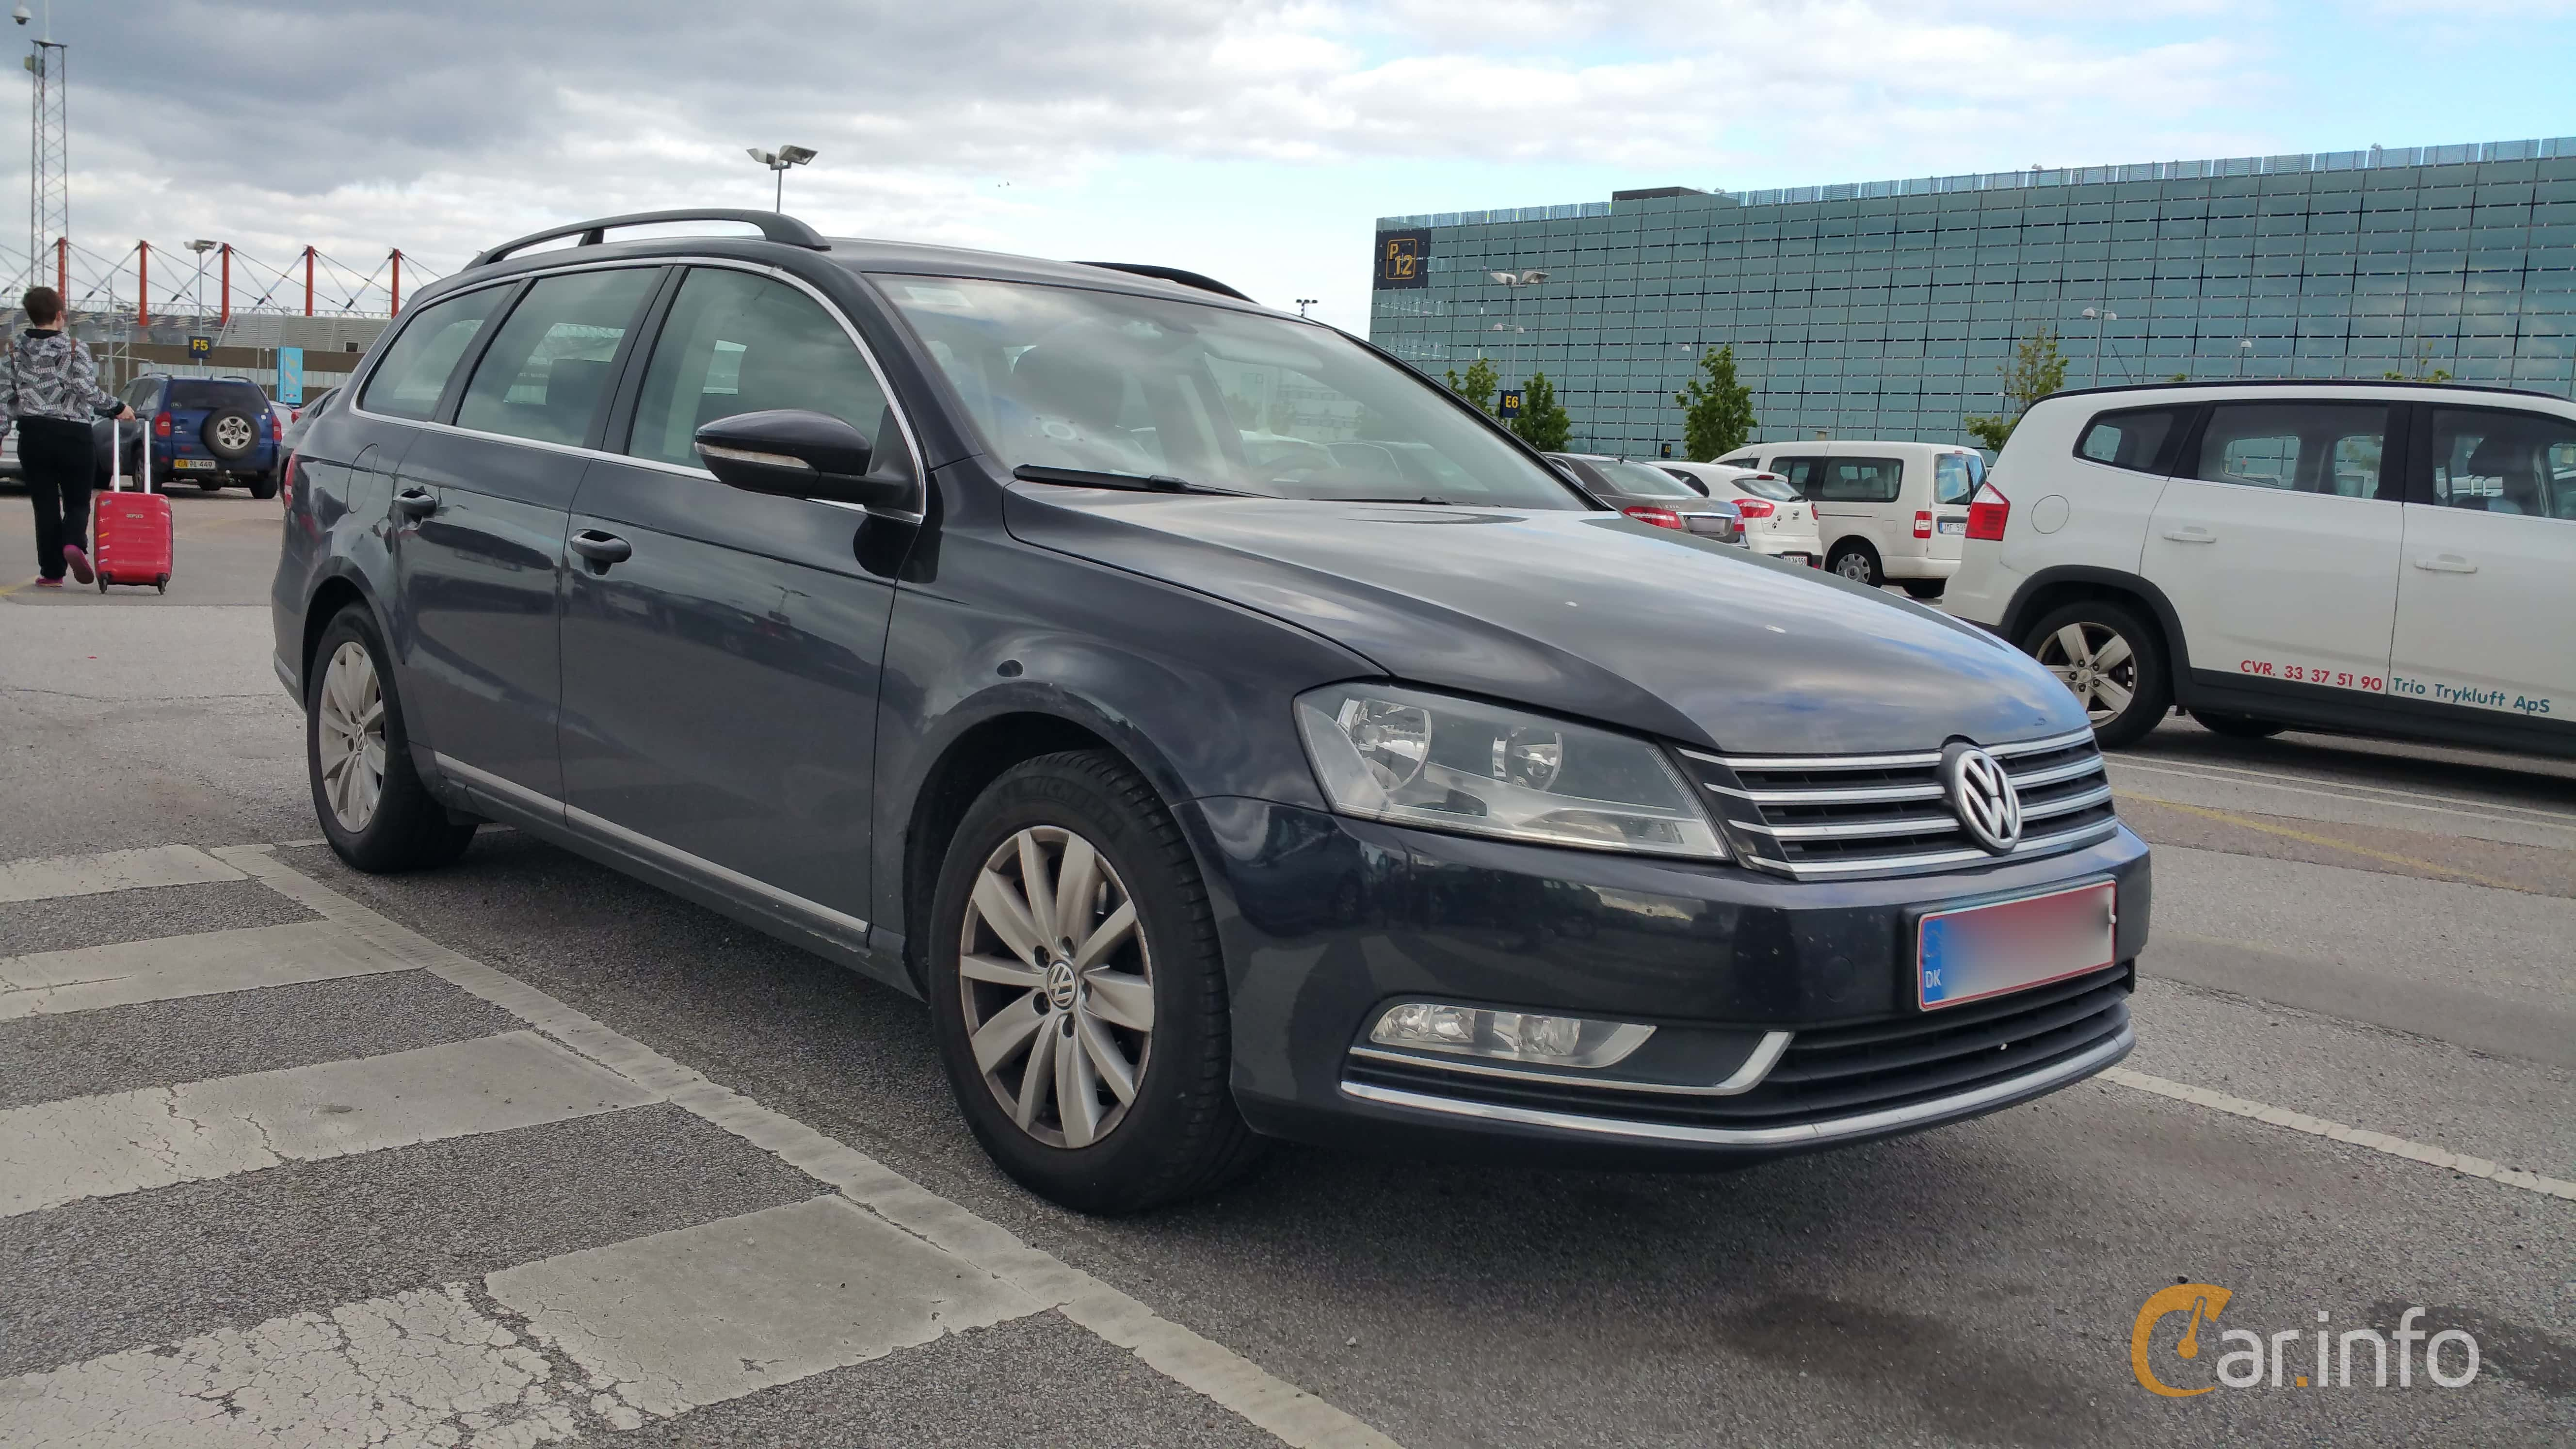 news look carolina durham first six quality month passat north volkswagen road h test a tdi at